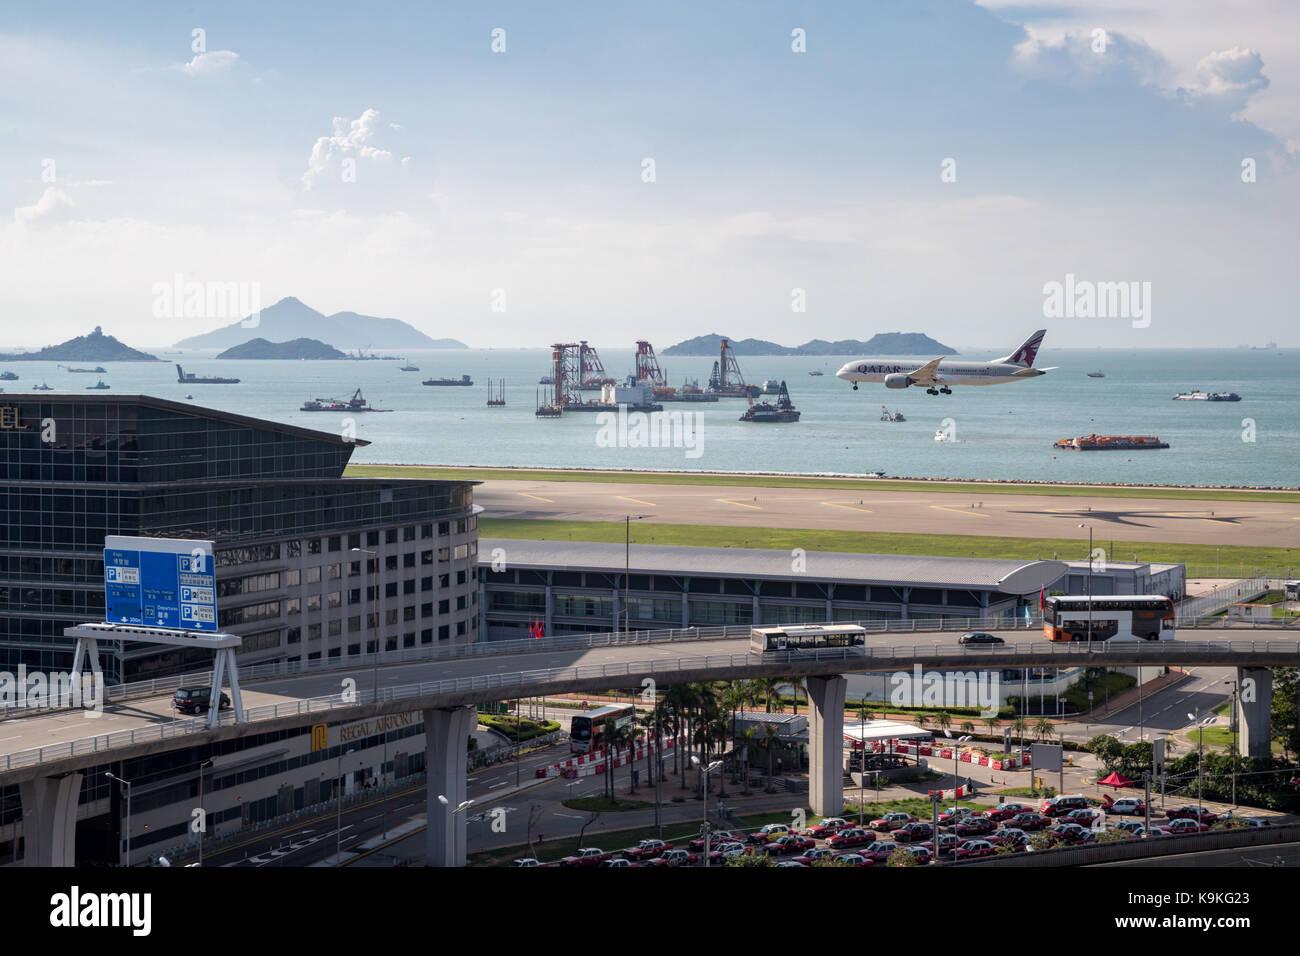 Lantau, Hong Kong  - September 10, 2017 :  Airplane landing at Hong Kong International Airport - Stock Image